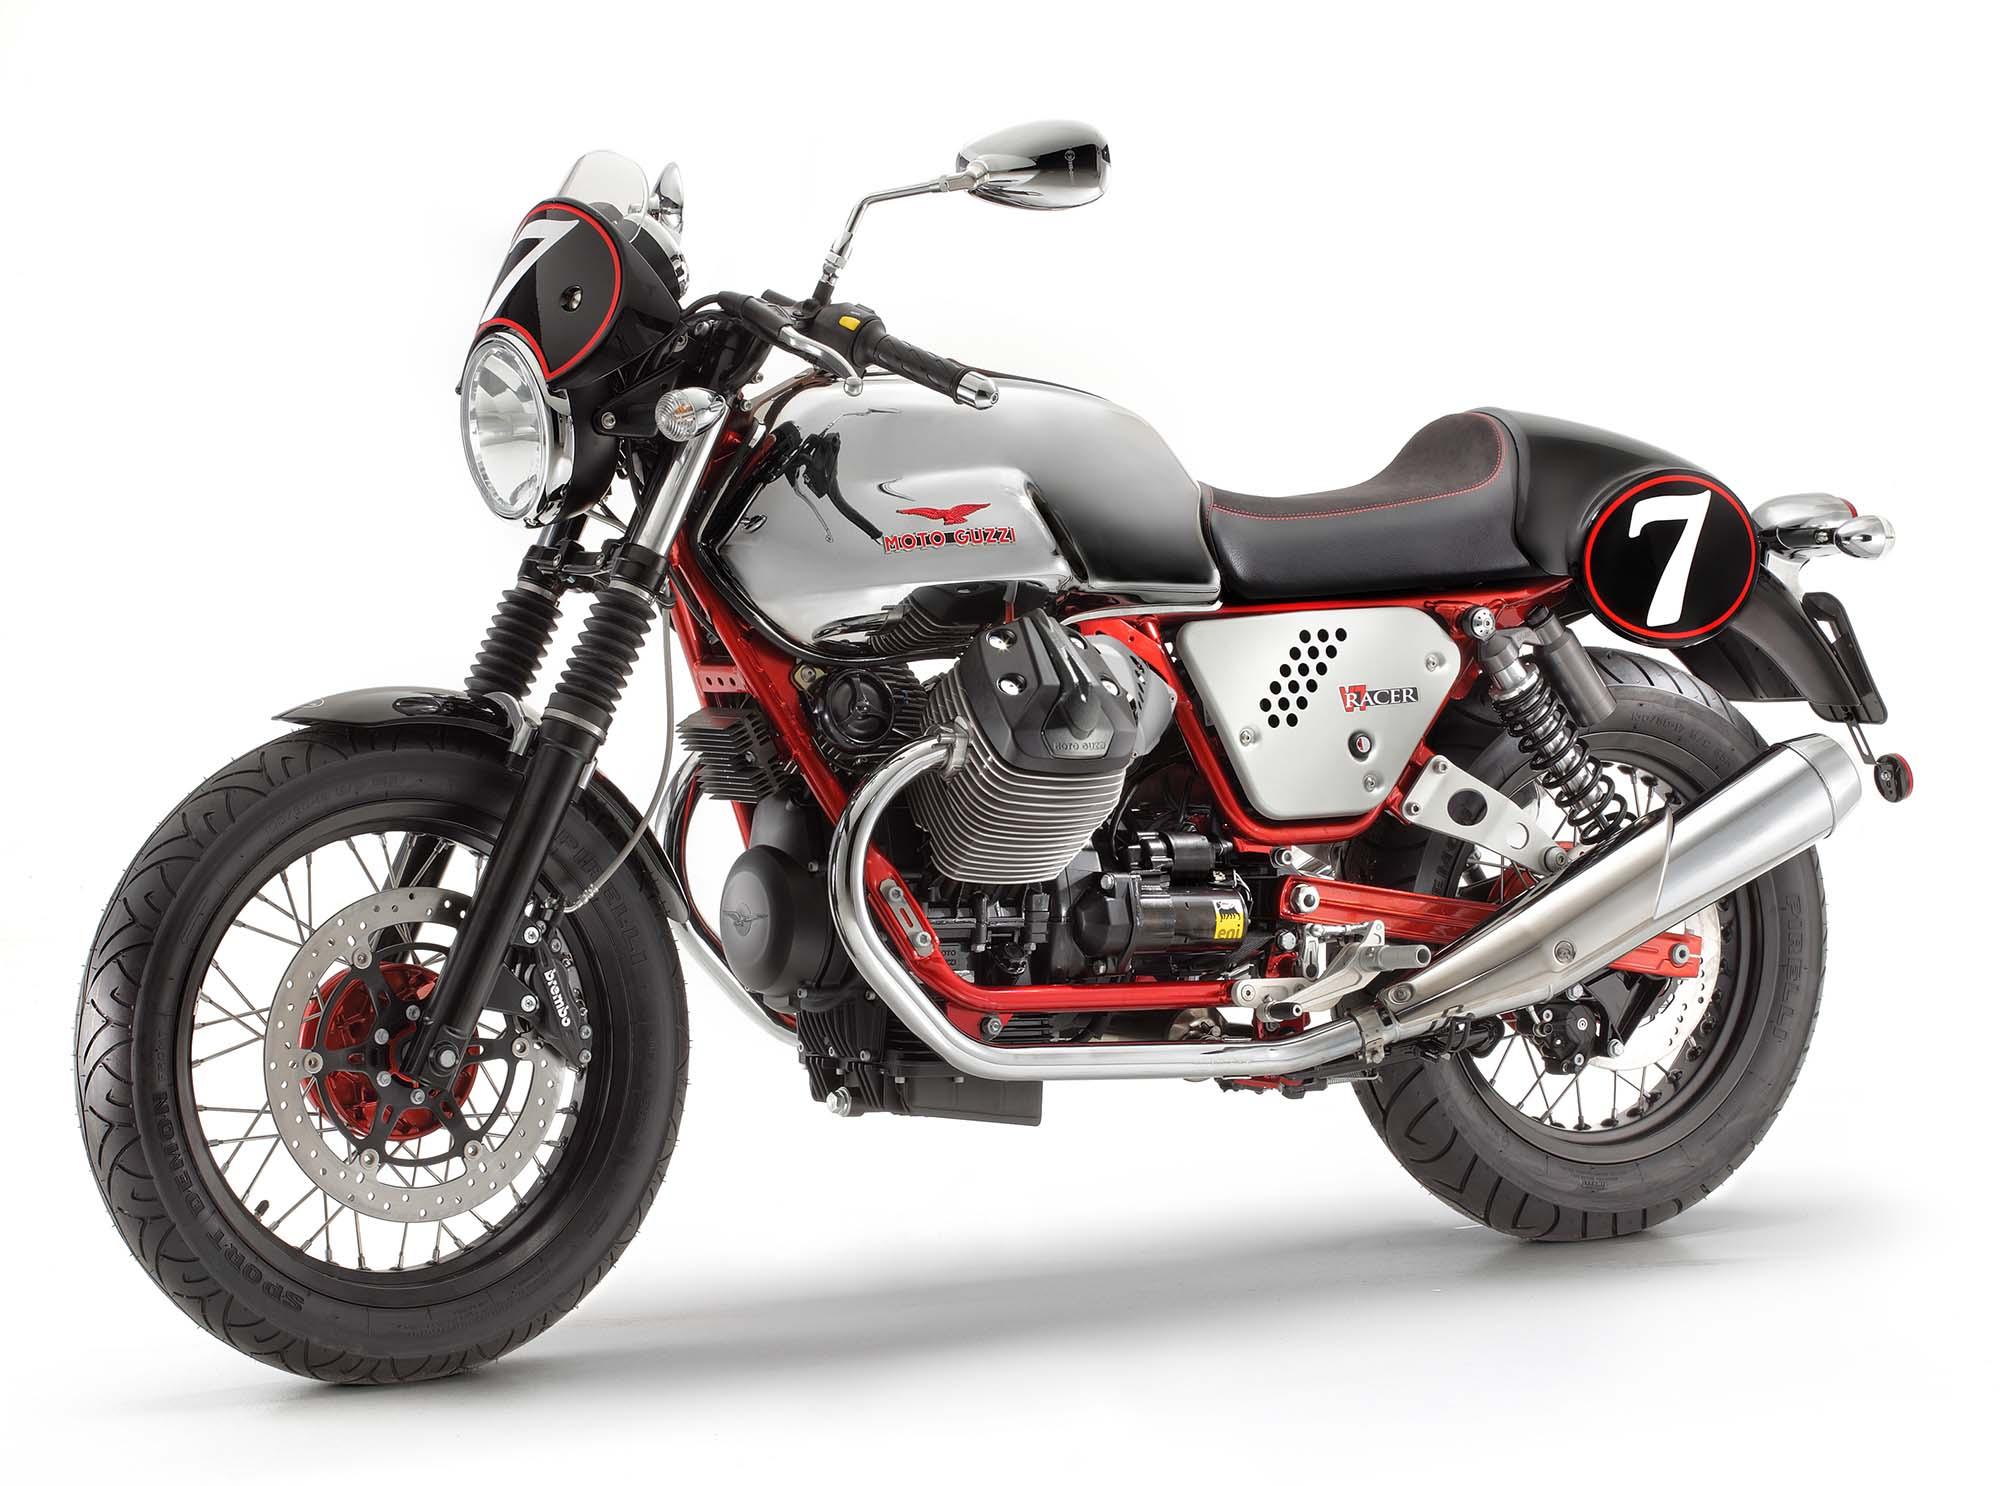 three moto guzzi v7 models coming to america for 2013 asphalt rubber. Black Bedroom Furniture Sets. Home Design Ideas